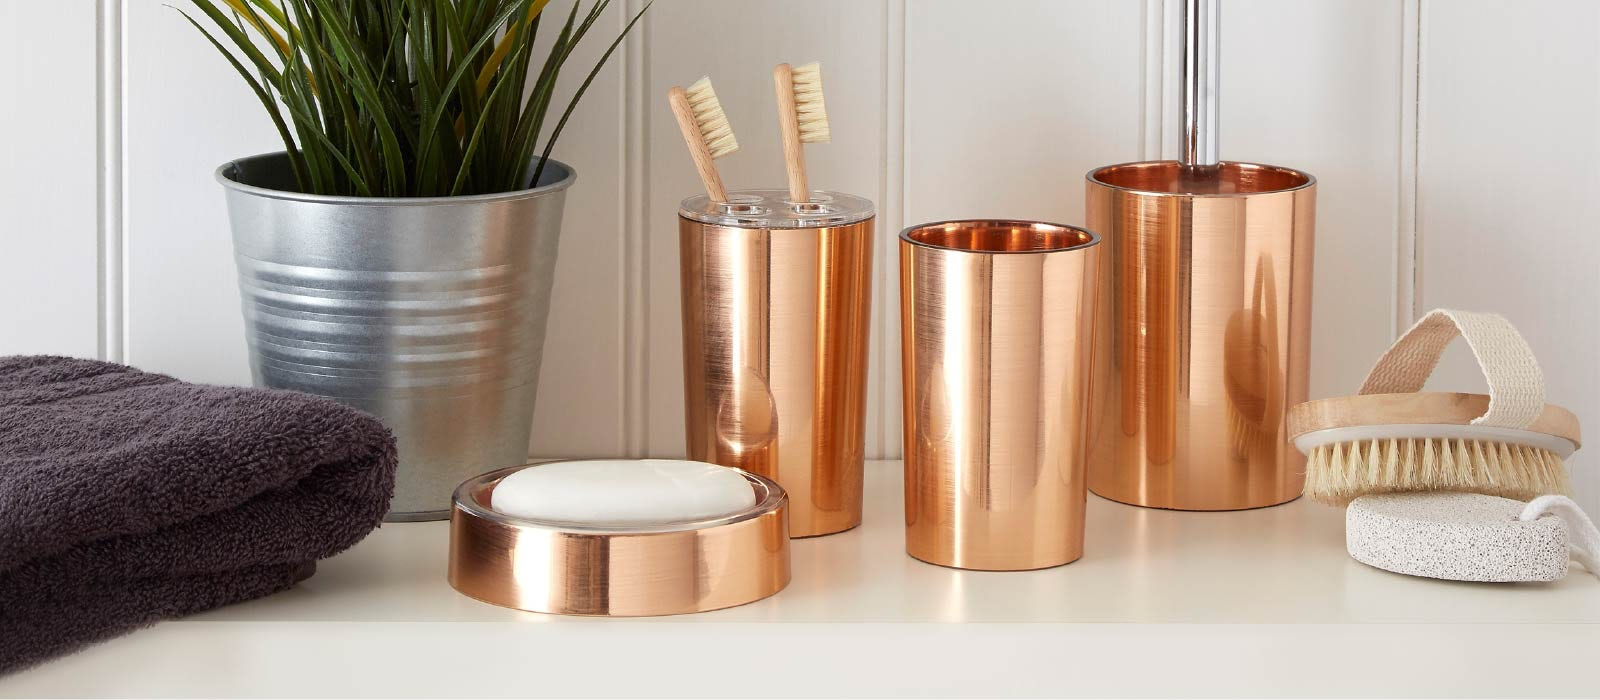 7 bathroom accessories you will love